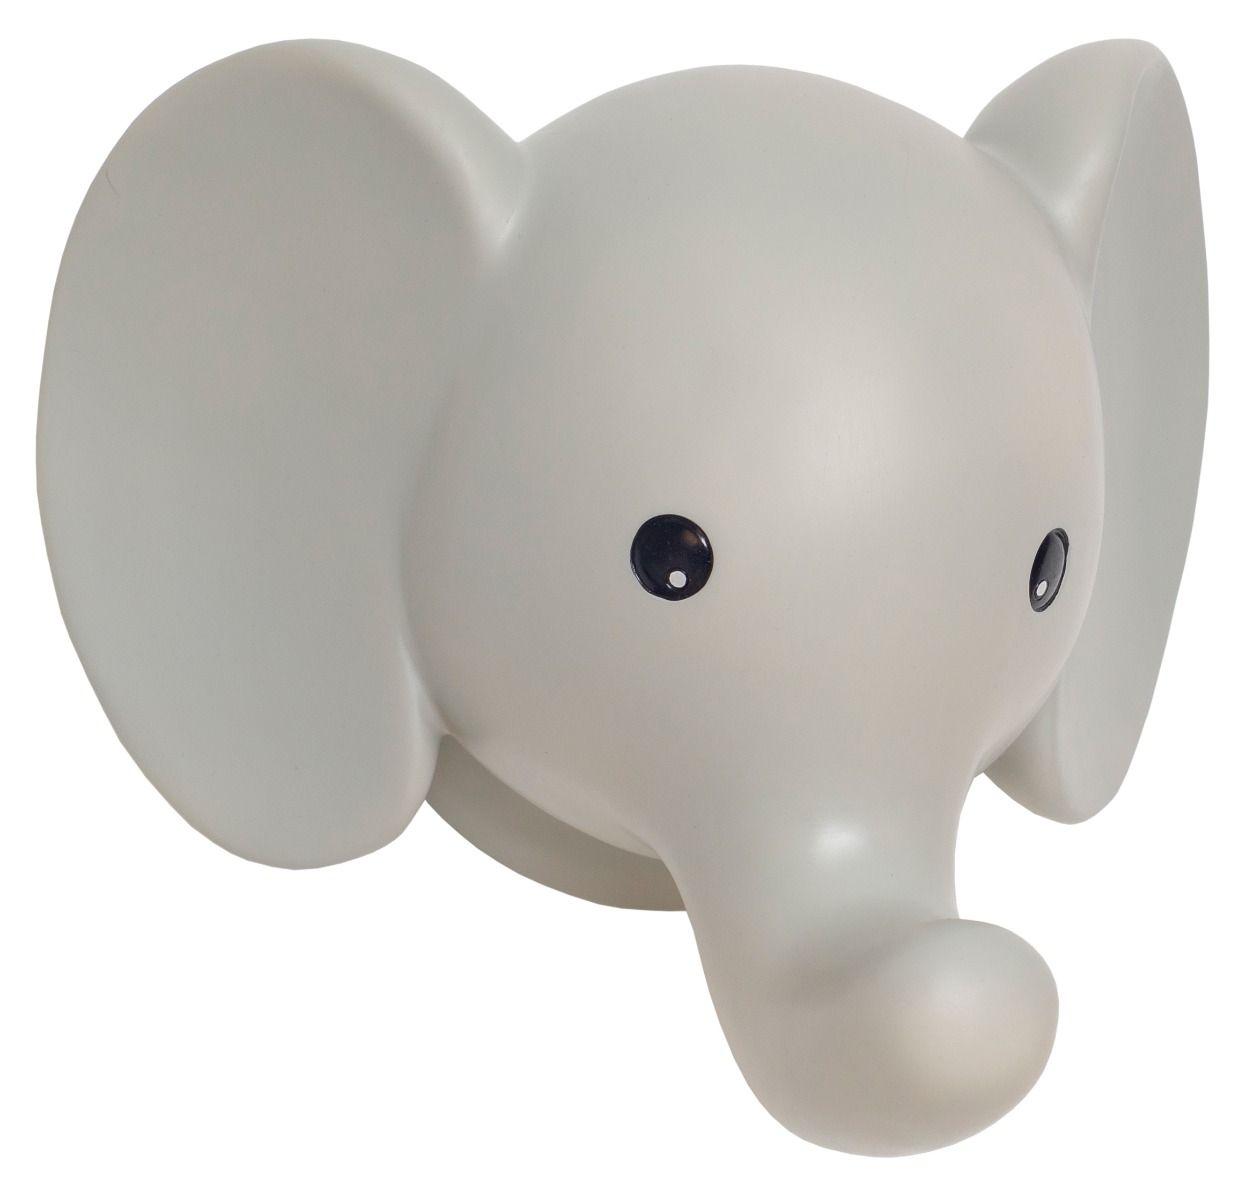 Nachtlicht Wandlampe Elefant grau